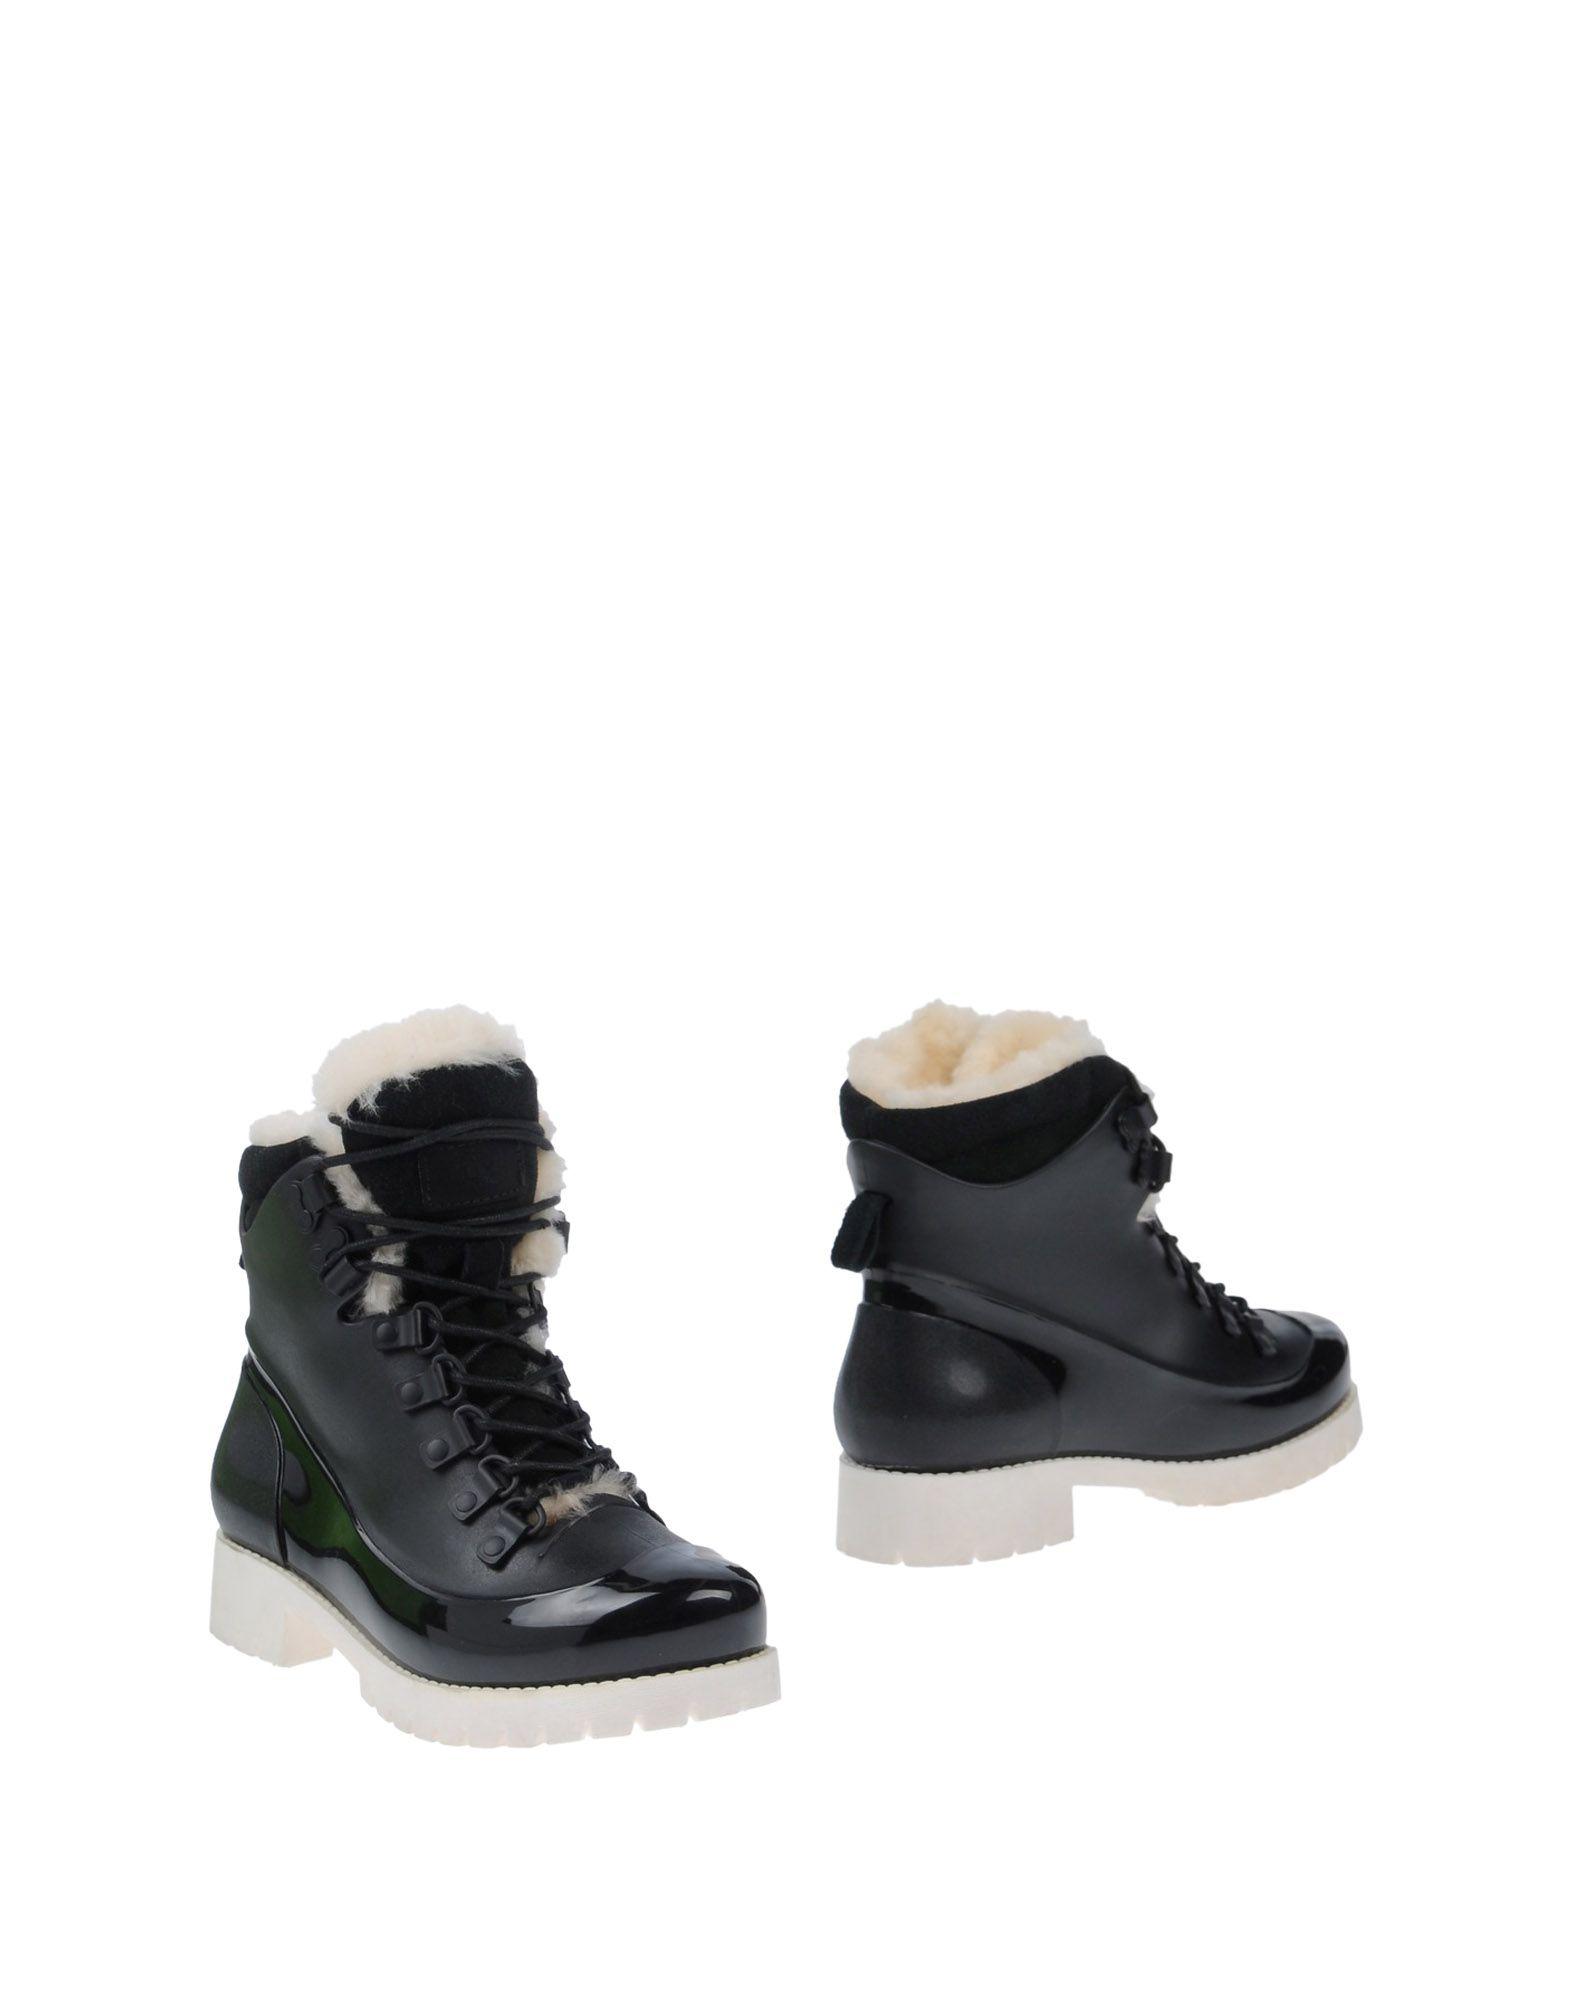 Australia Luxe Collective Stiefelette Damen Schuhe  11480578ET Neue Schuhe Damen bf347c